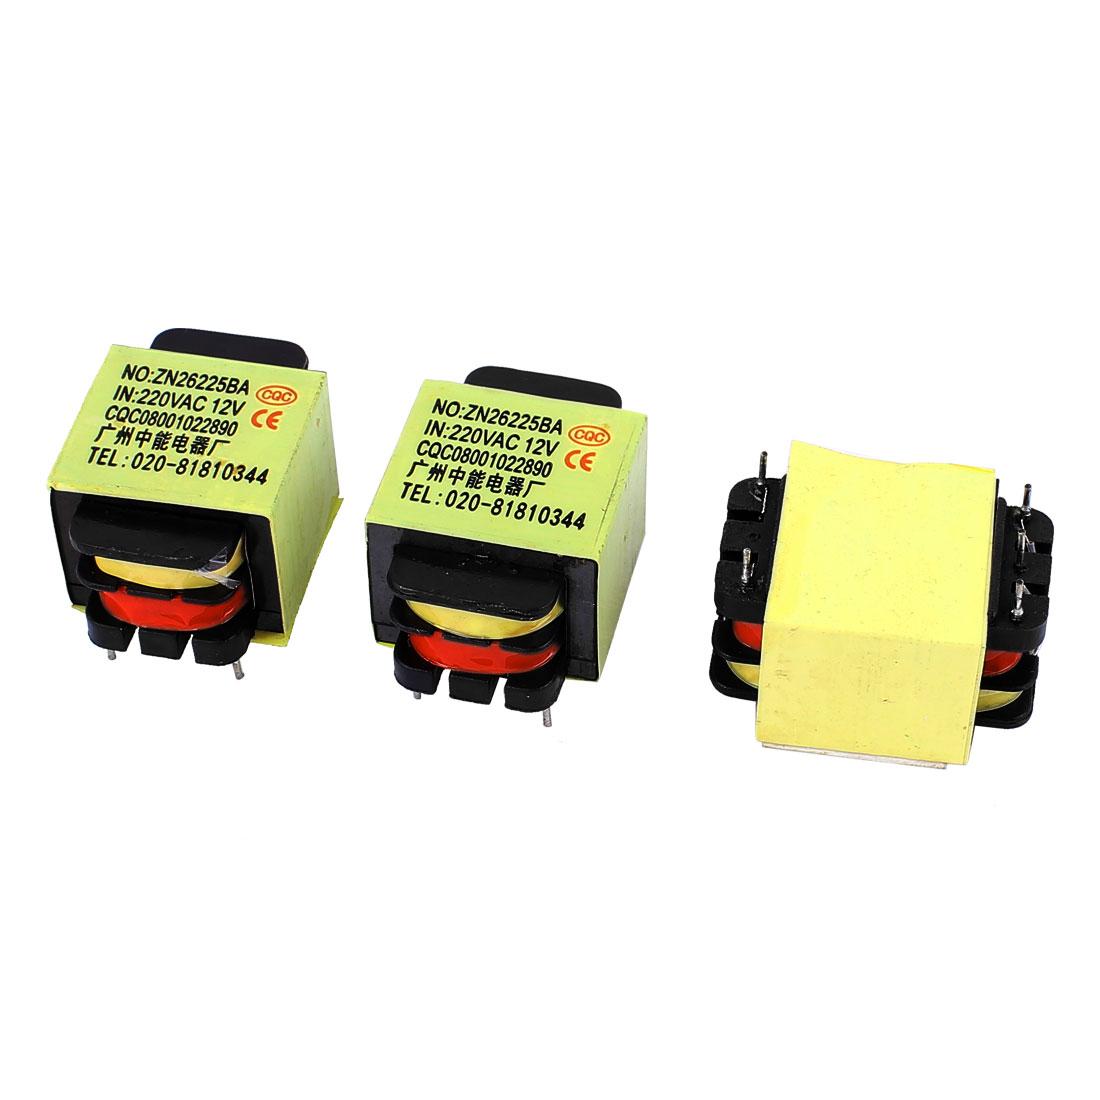 3Pcs 220V Input 12V 1.2VA Output Yellow Red Ferrite Core Power Transformer ZN26225BA